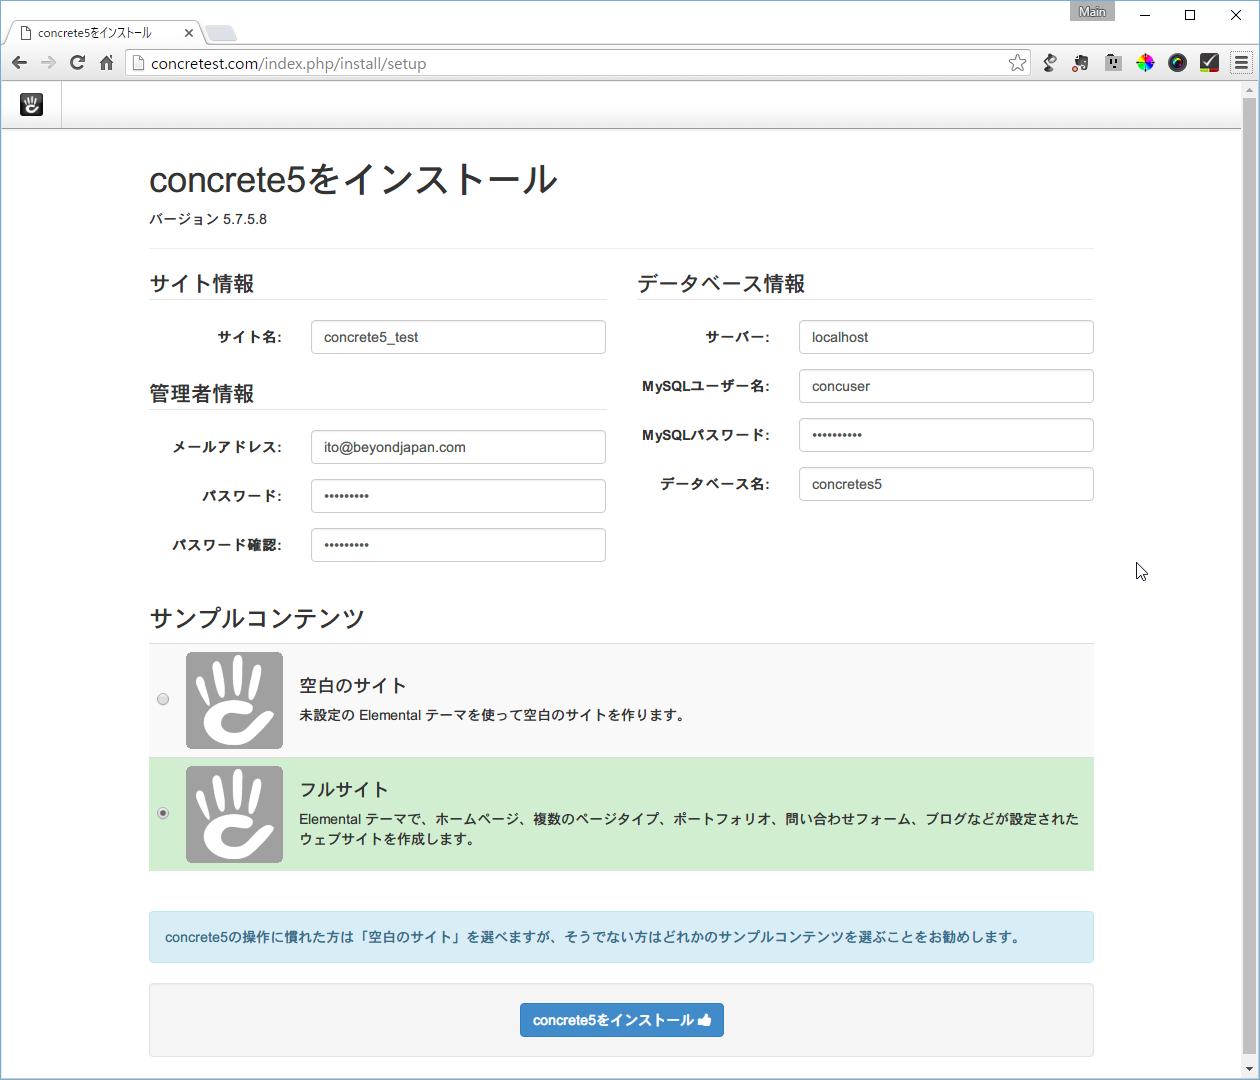 SnapCrab_concrete5をインストール - Google Chrome_2016-6-27_22-5-59_No-00